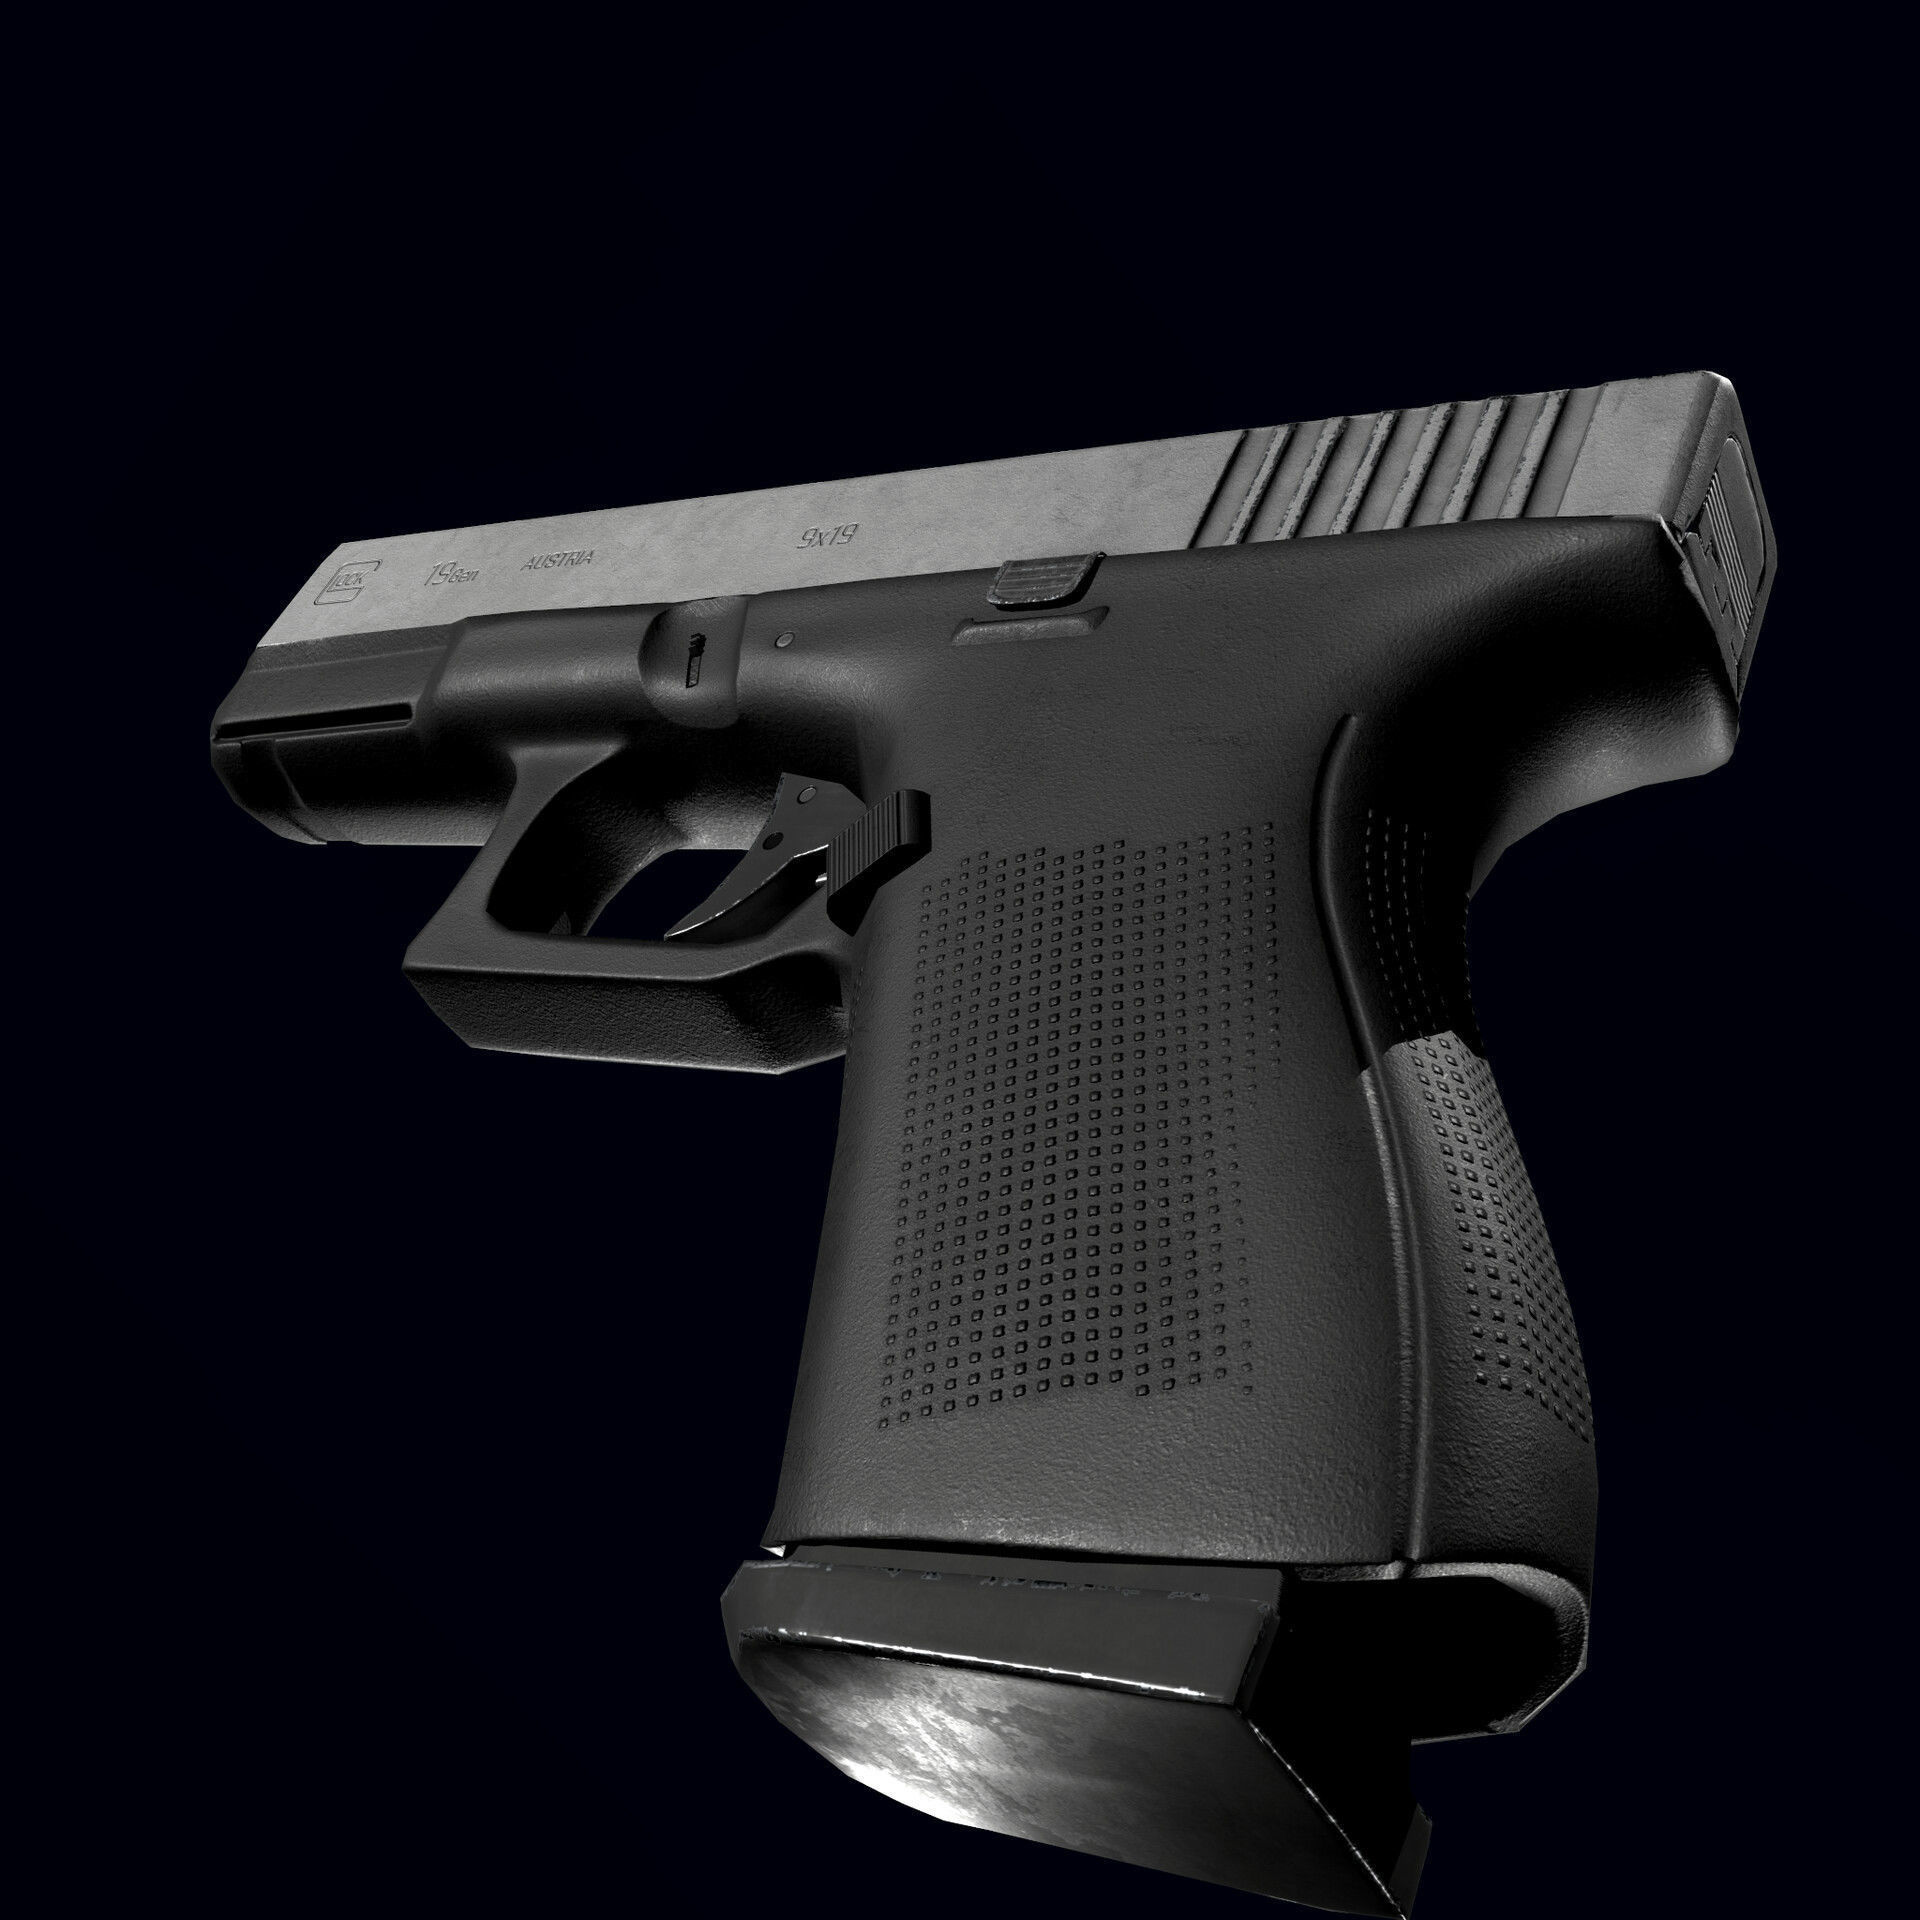 Pistol Glock 19 game ready